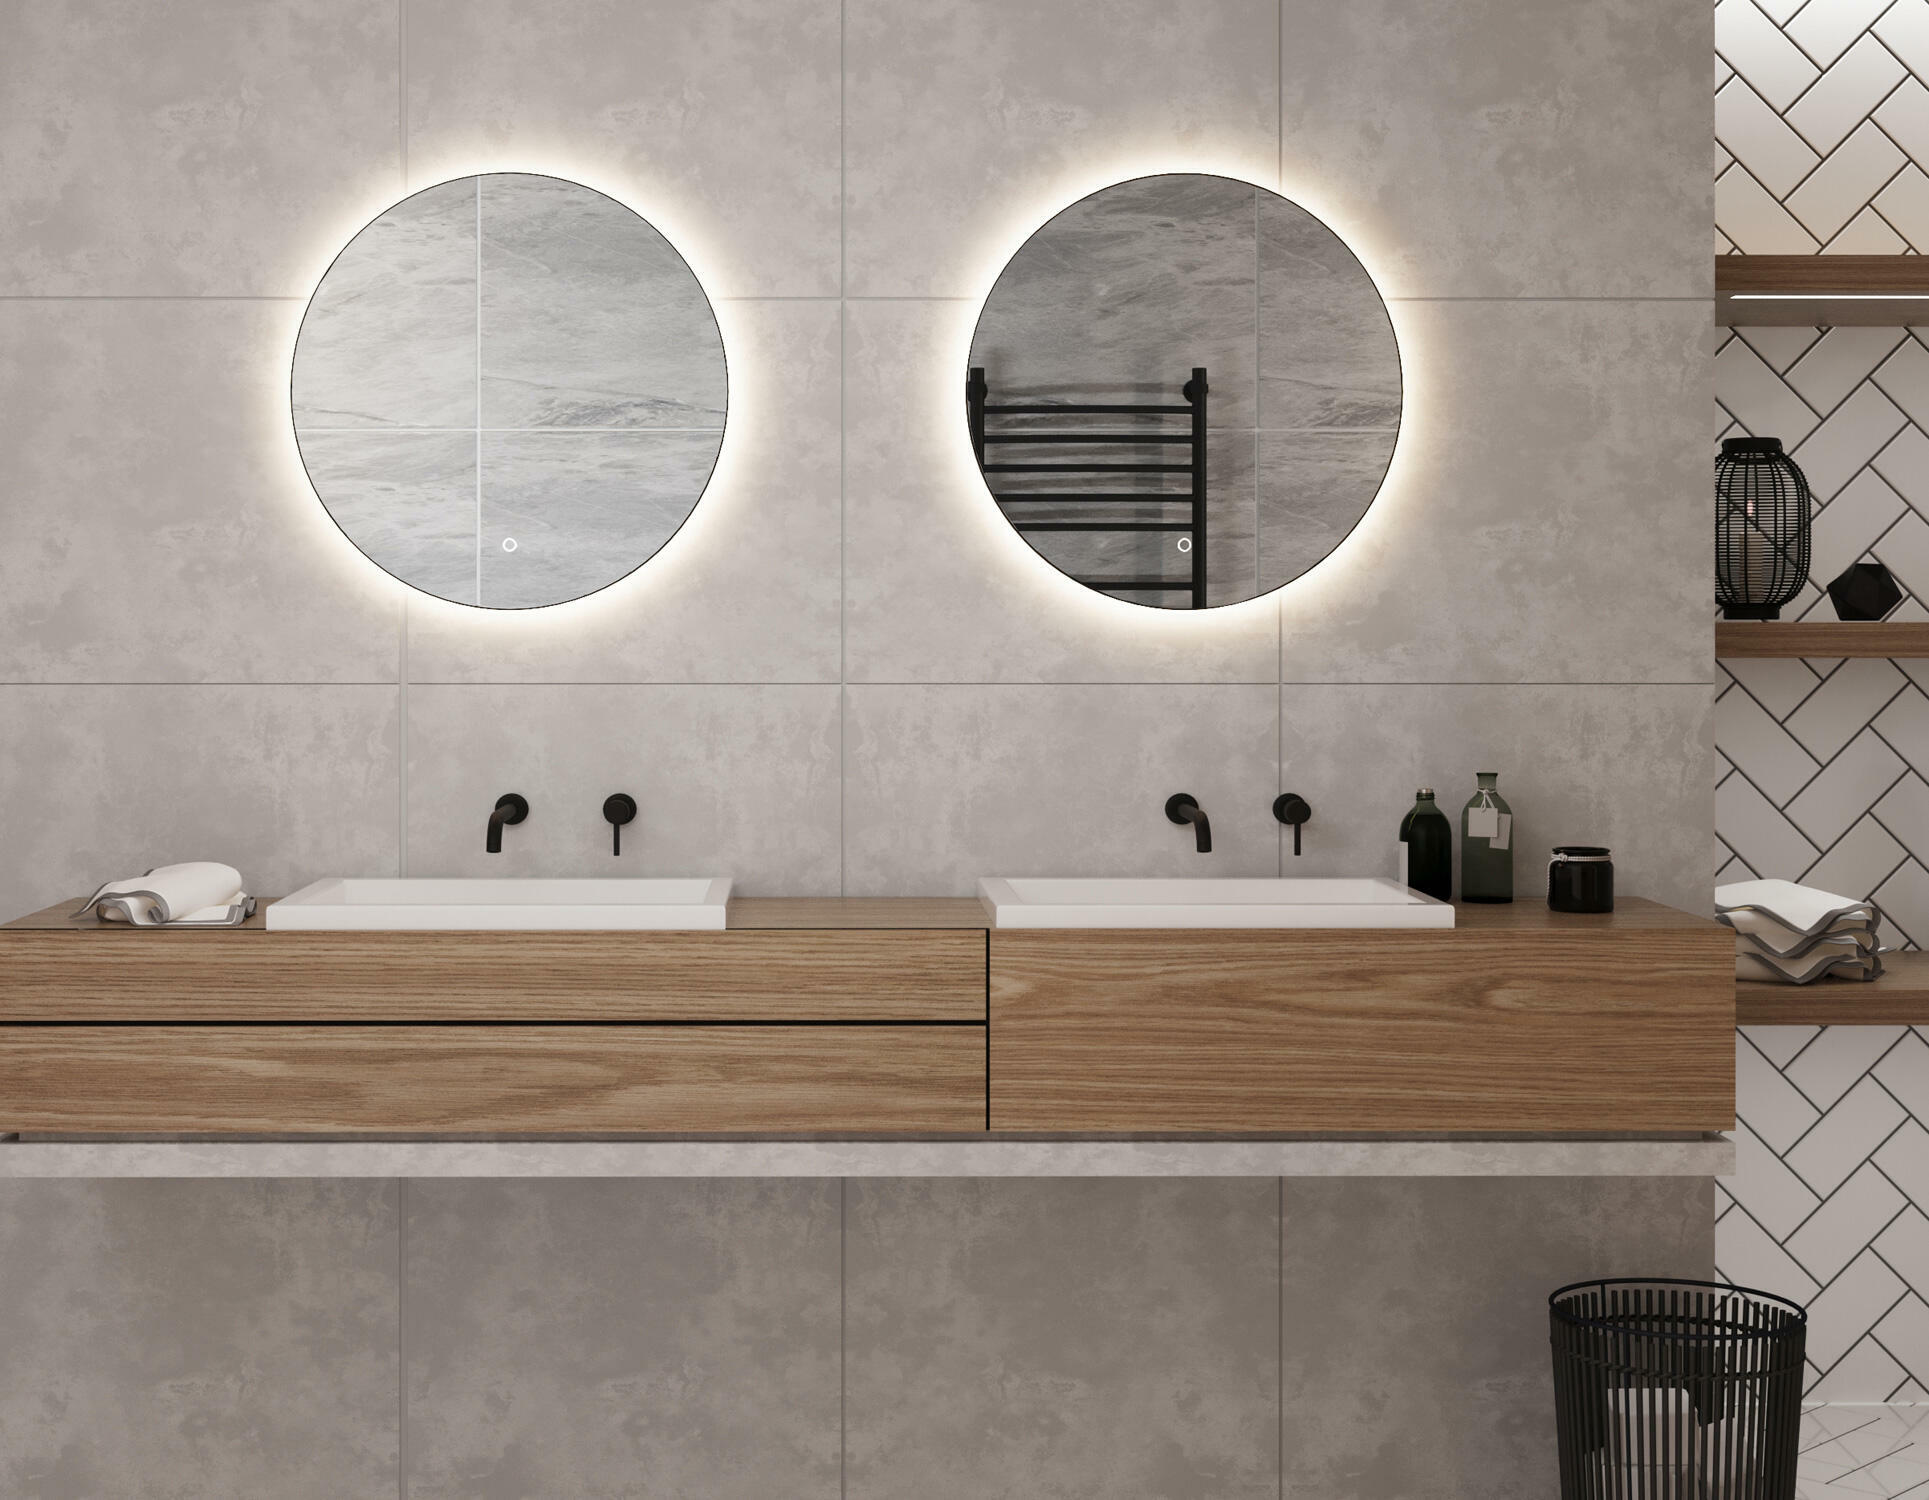 2 ronde spiegels met led verlichting